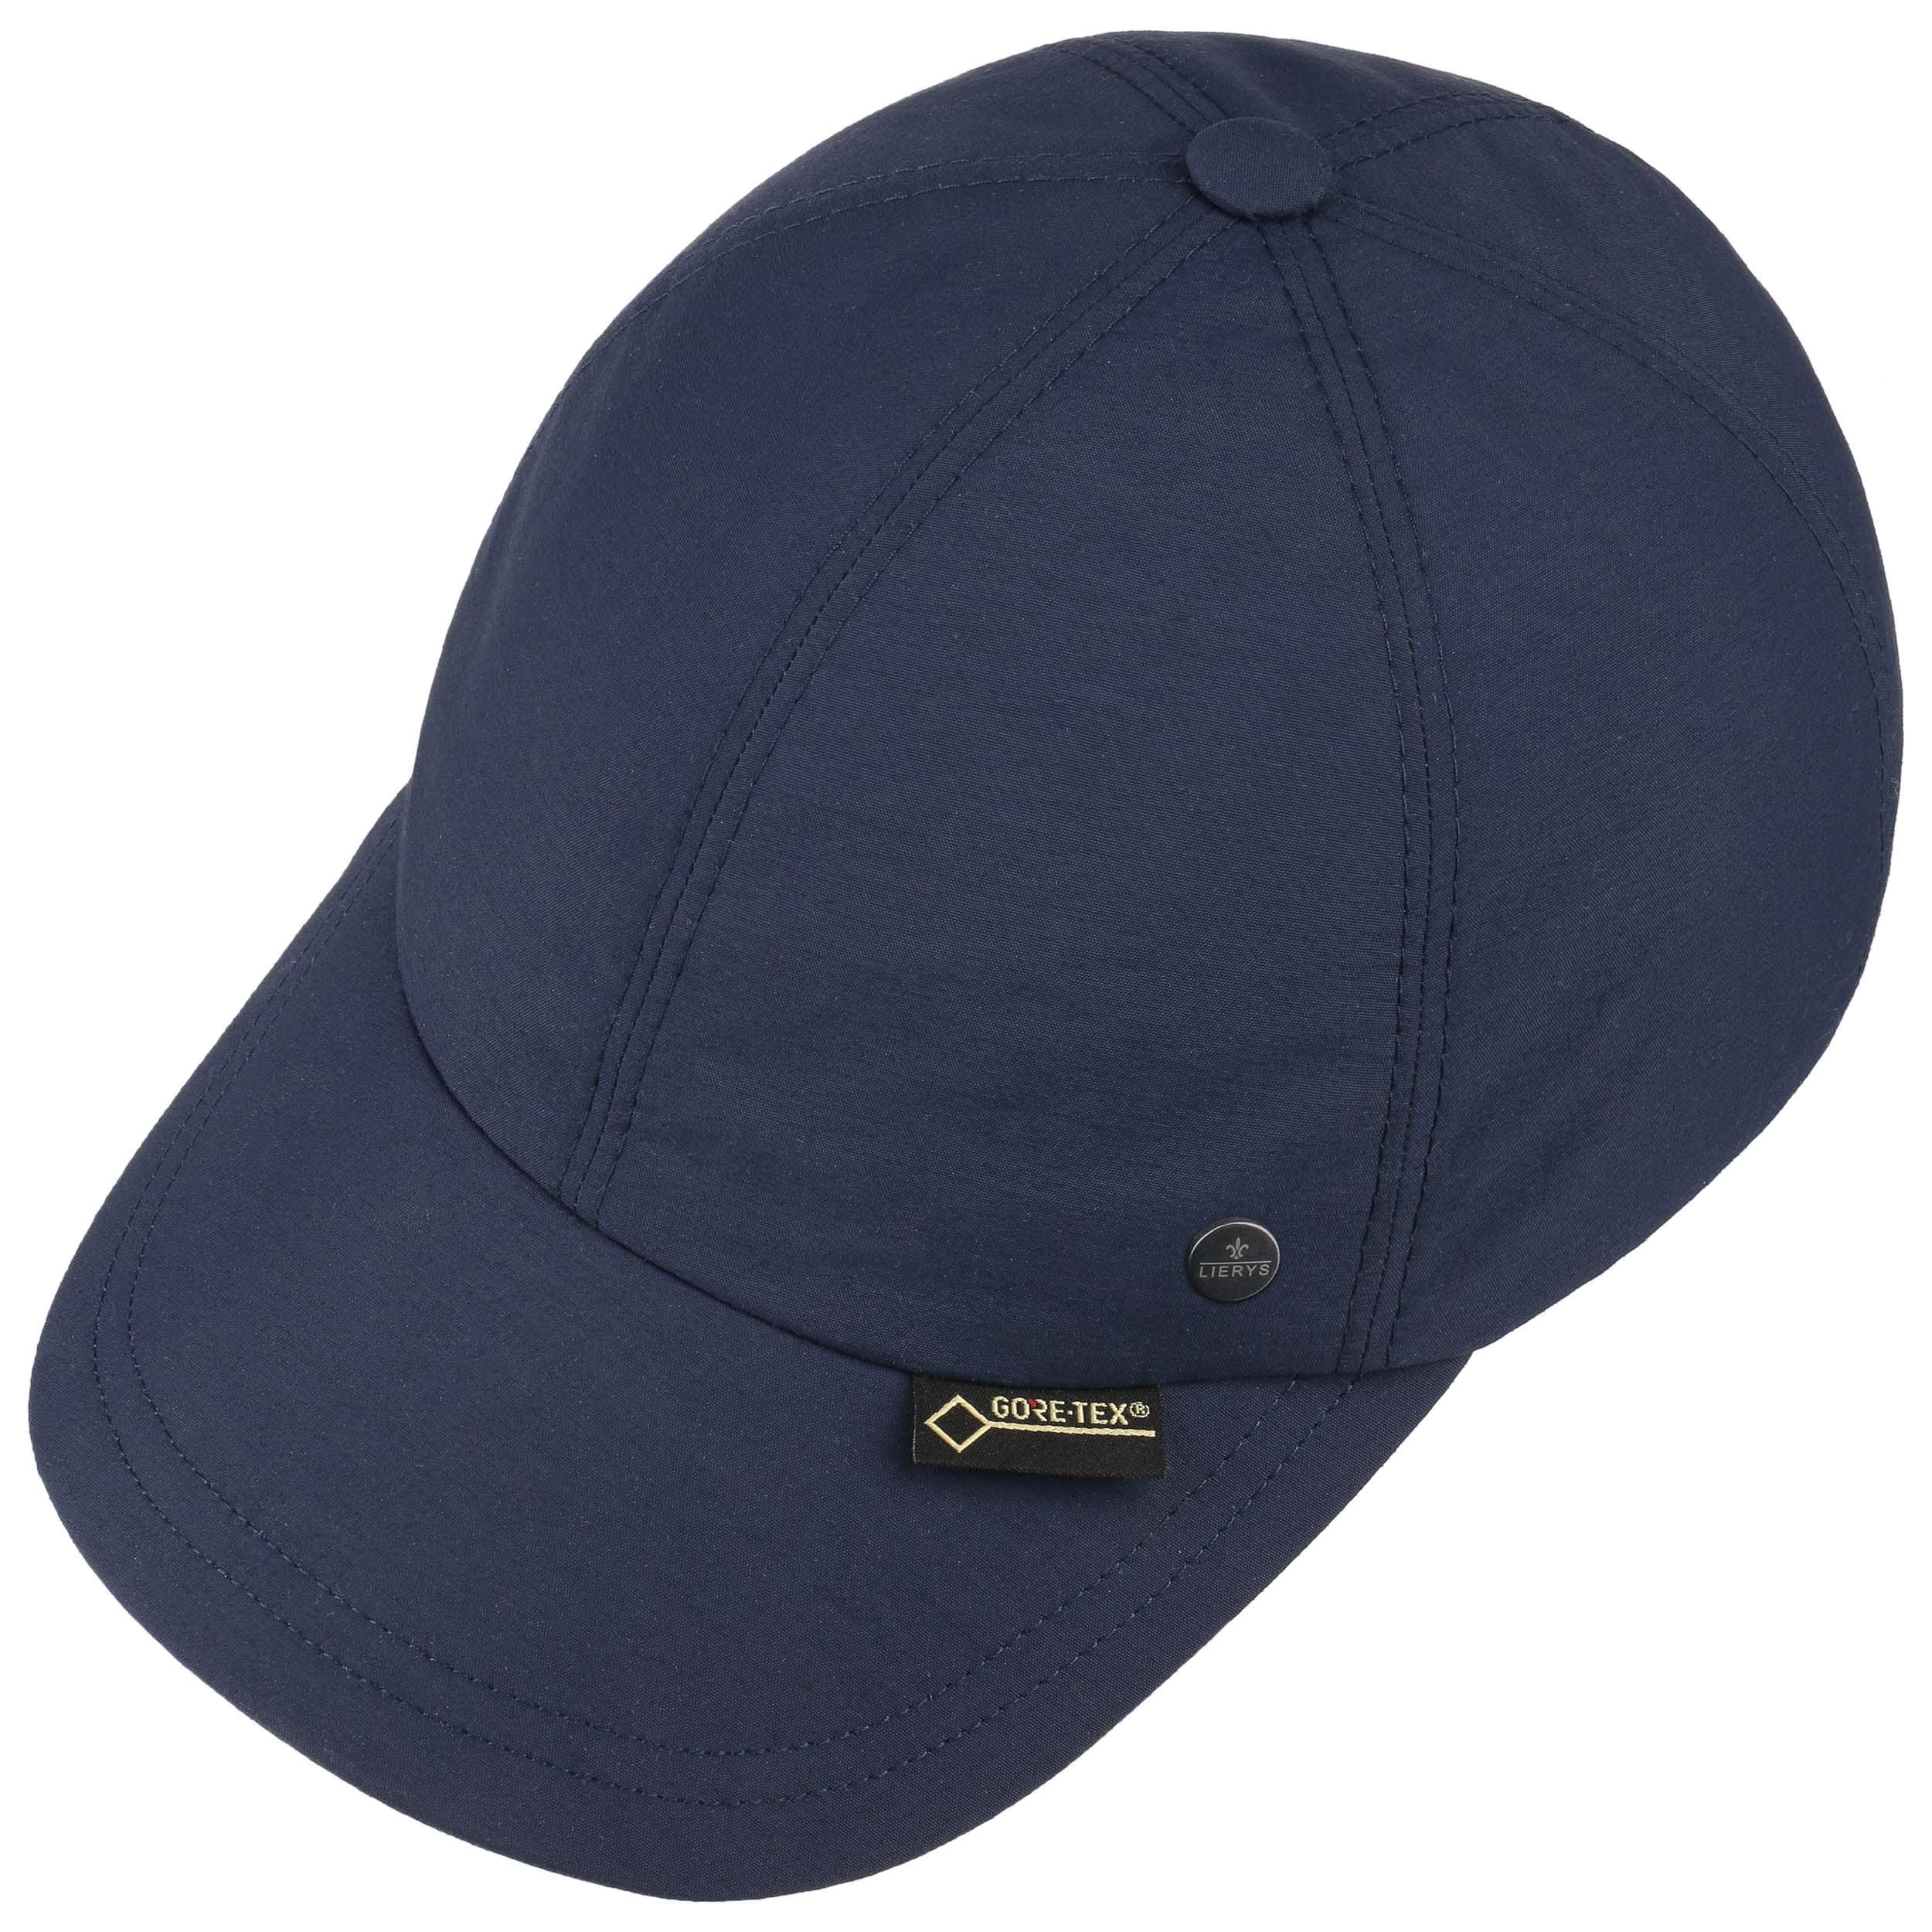 Gorra Steven Uni Gore-Tex by Lierys - Gorras - sombreroshop.es 930f9645a87